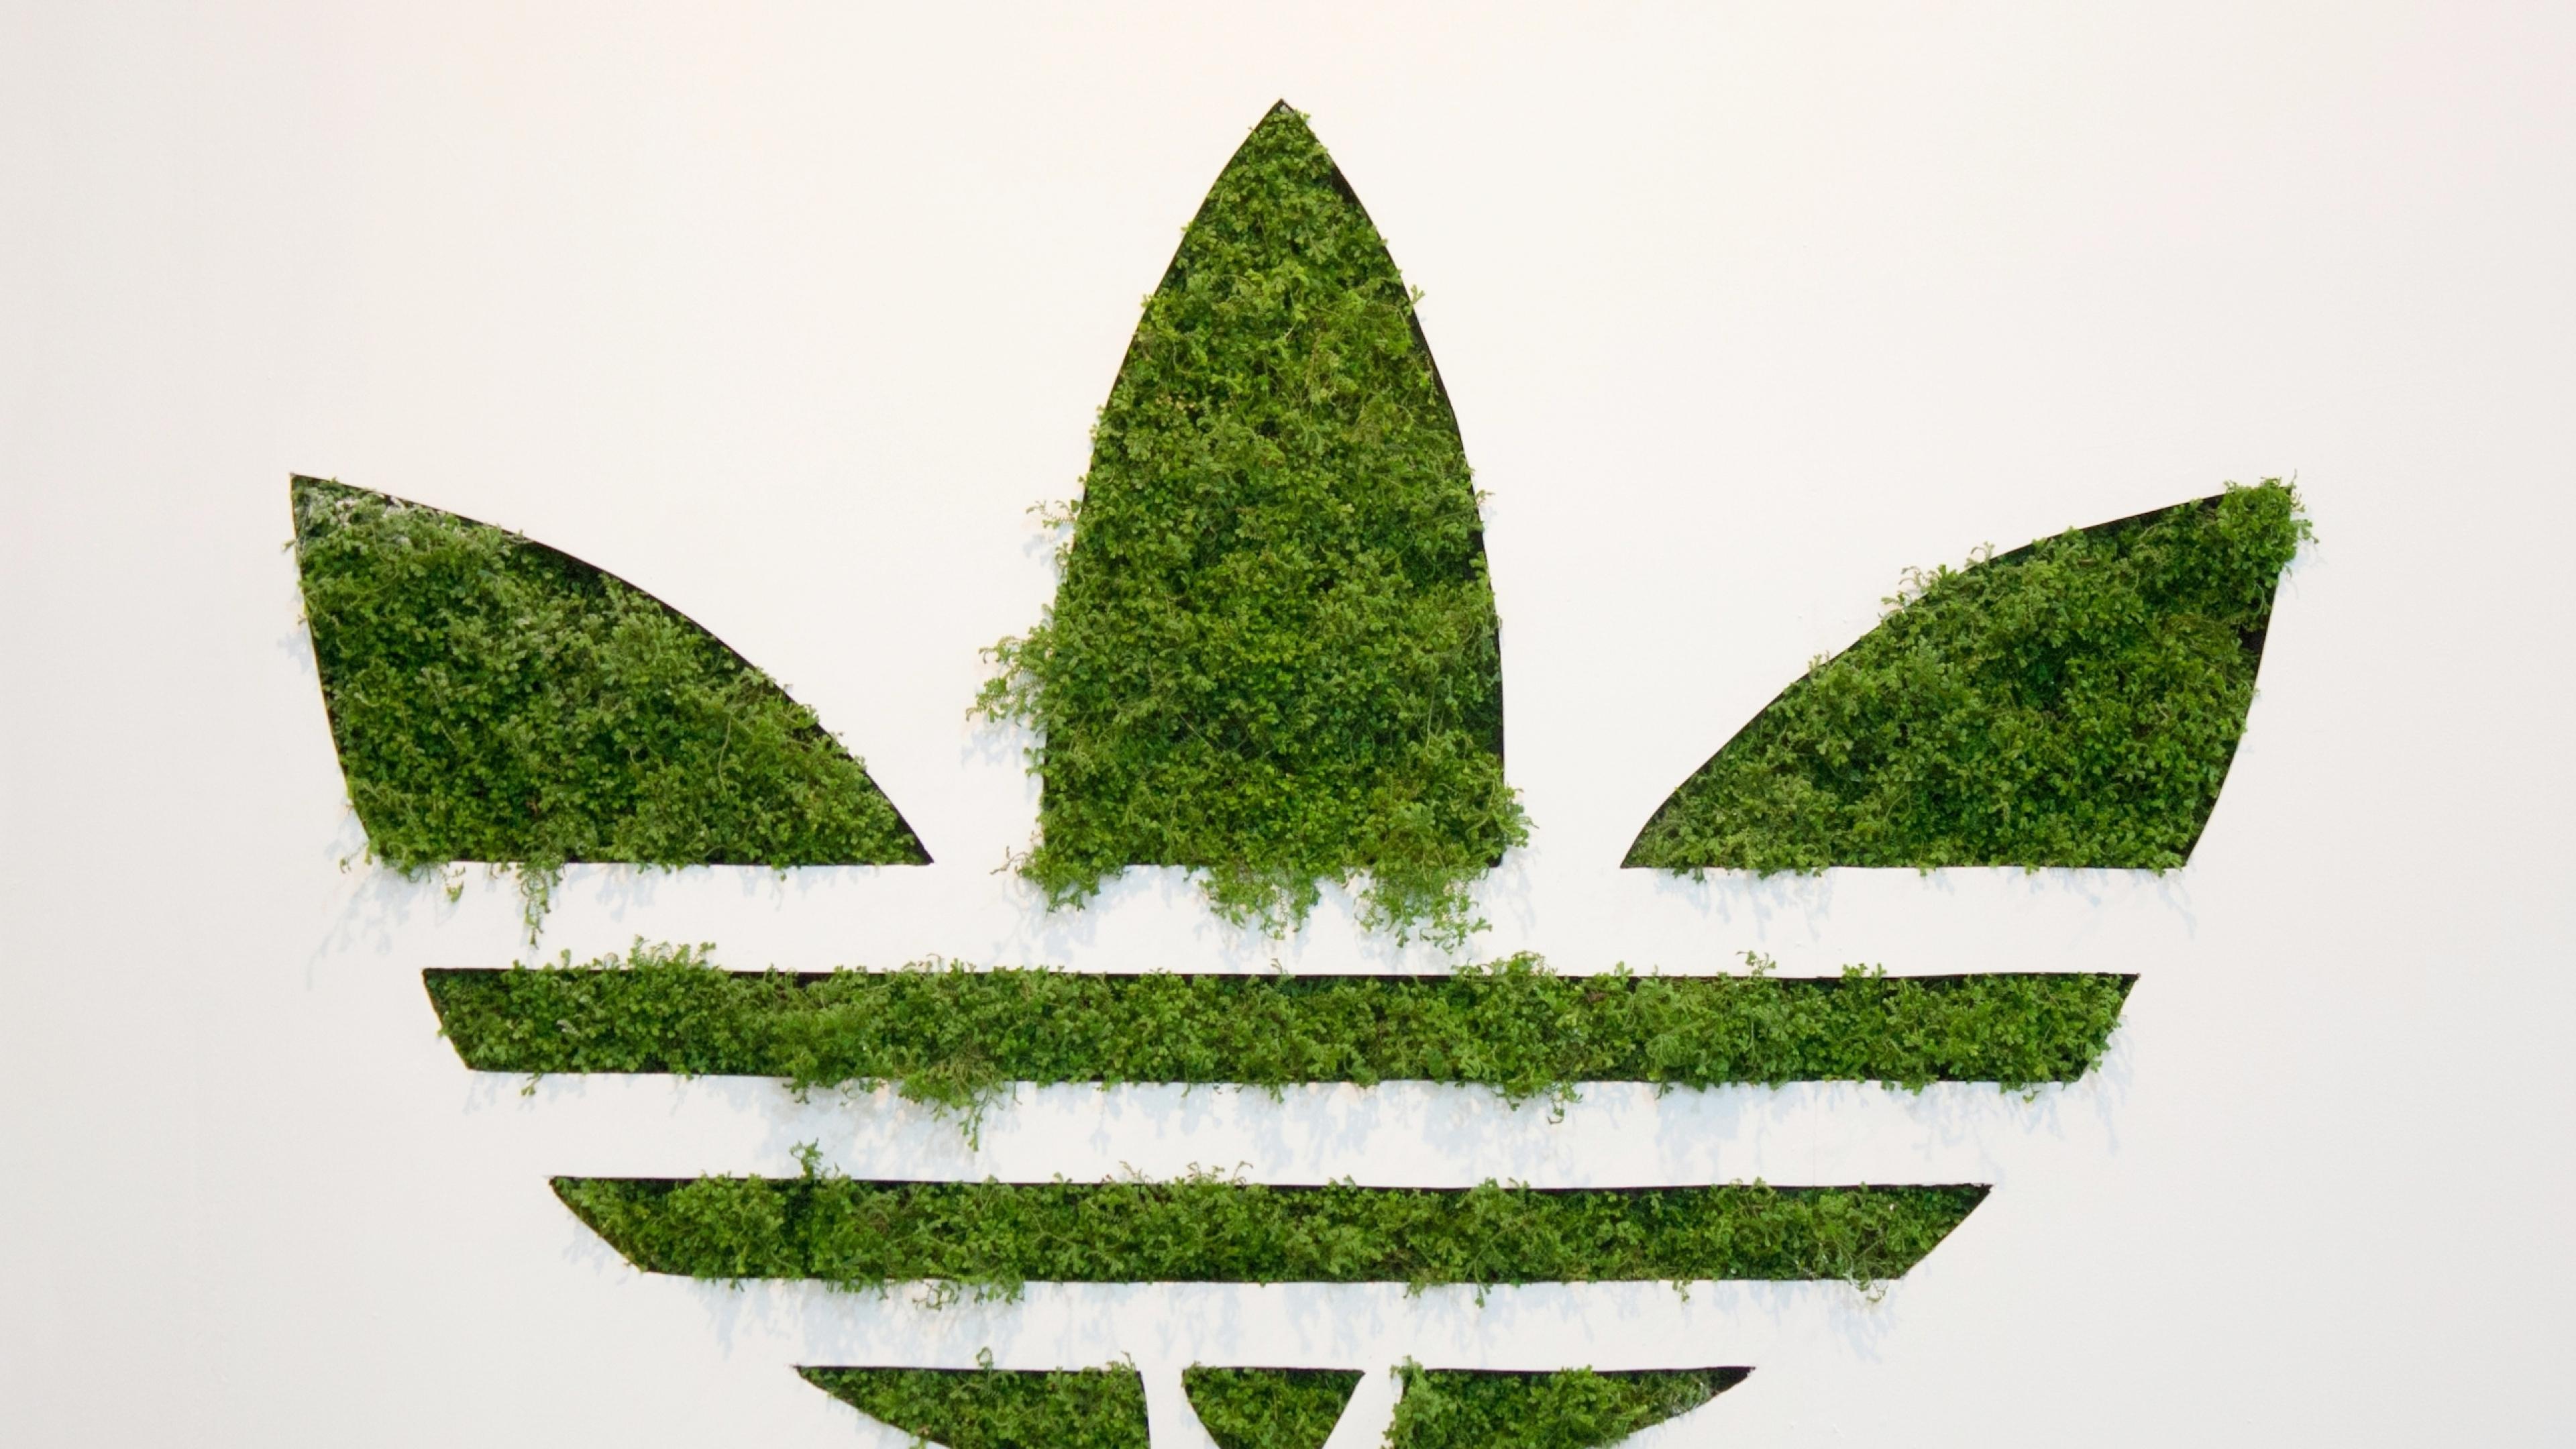 Adidas Grass Logo (Laptop Full HD 1080P)